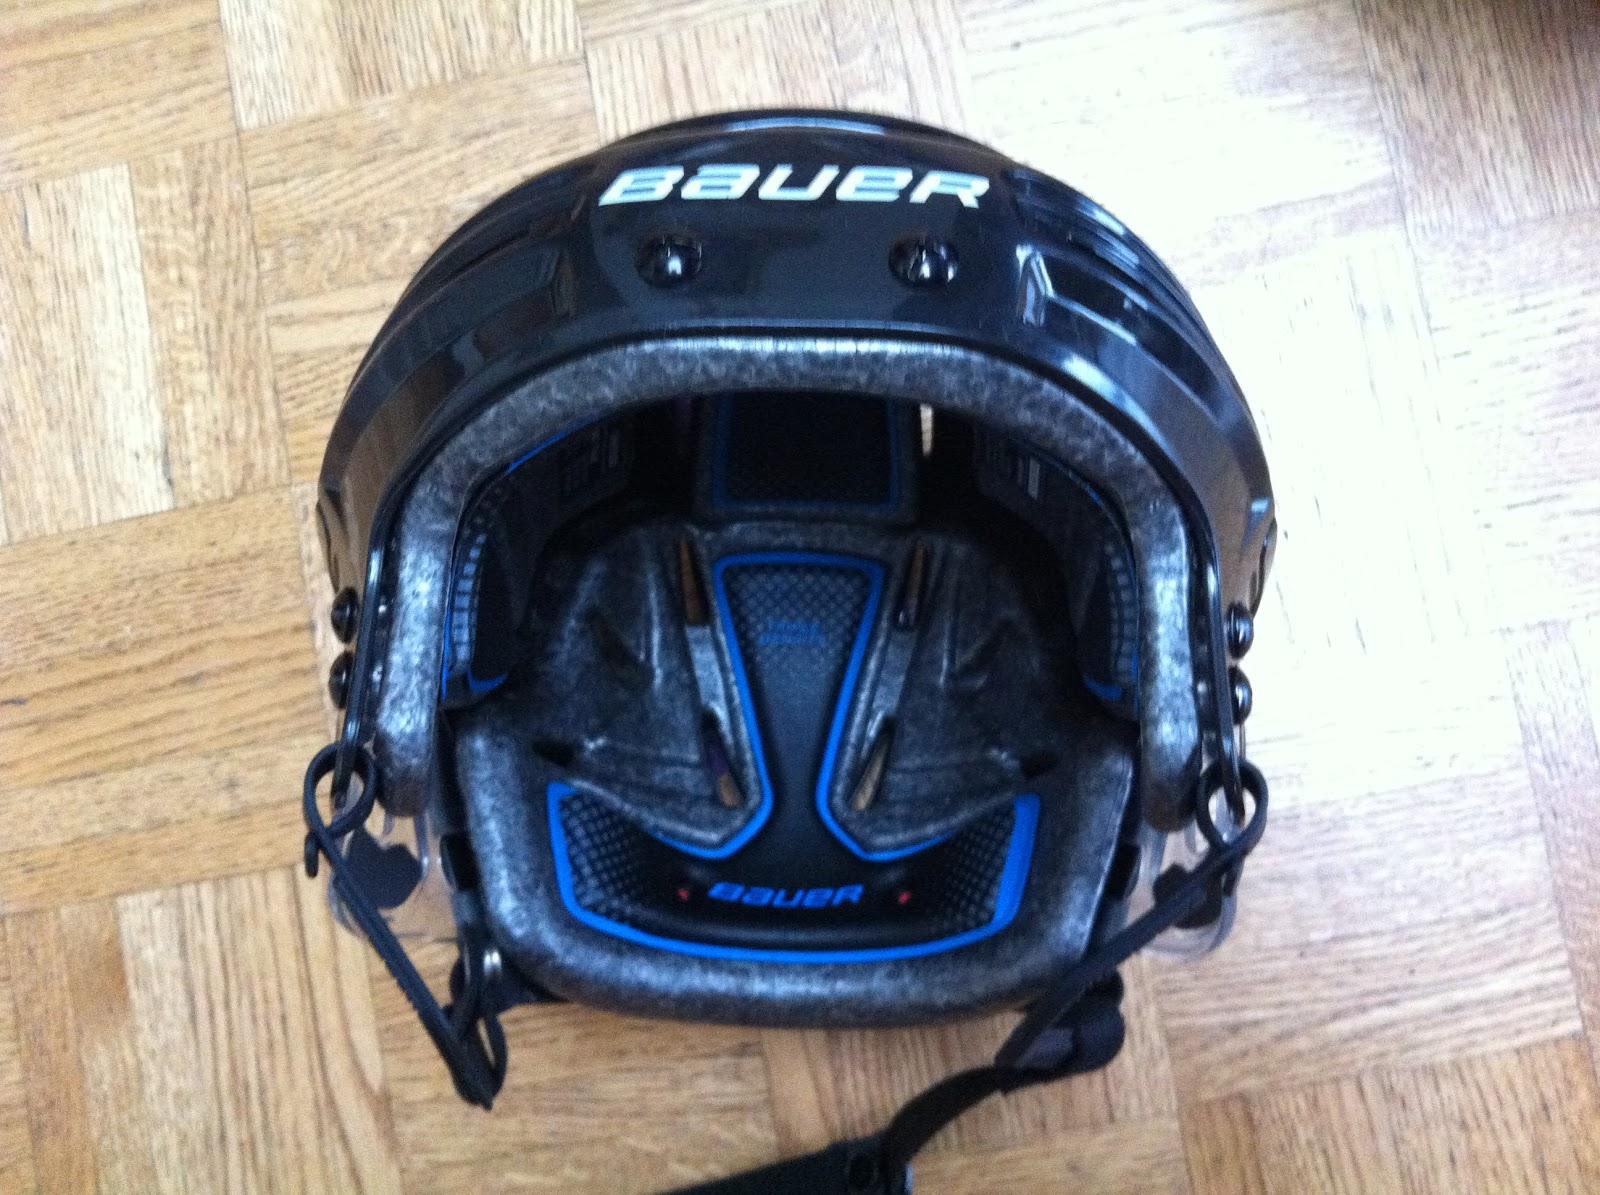 Garage Sale: 2 Kids Hockey Helmets size 61/2 to 7 3/4